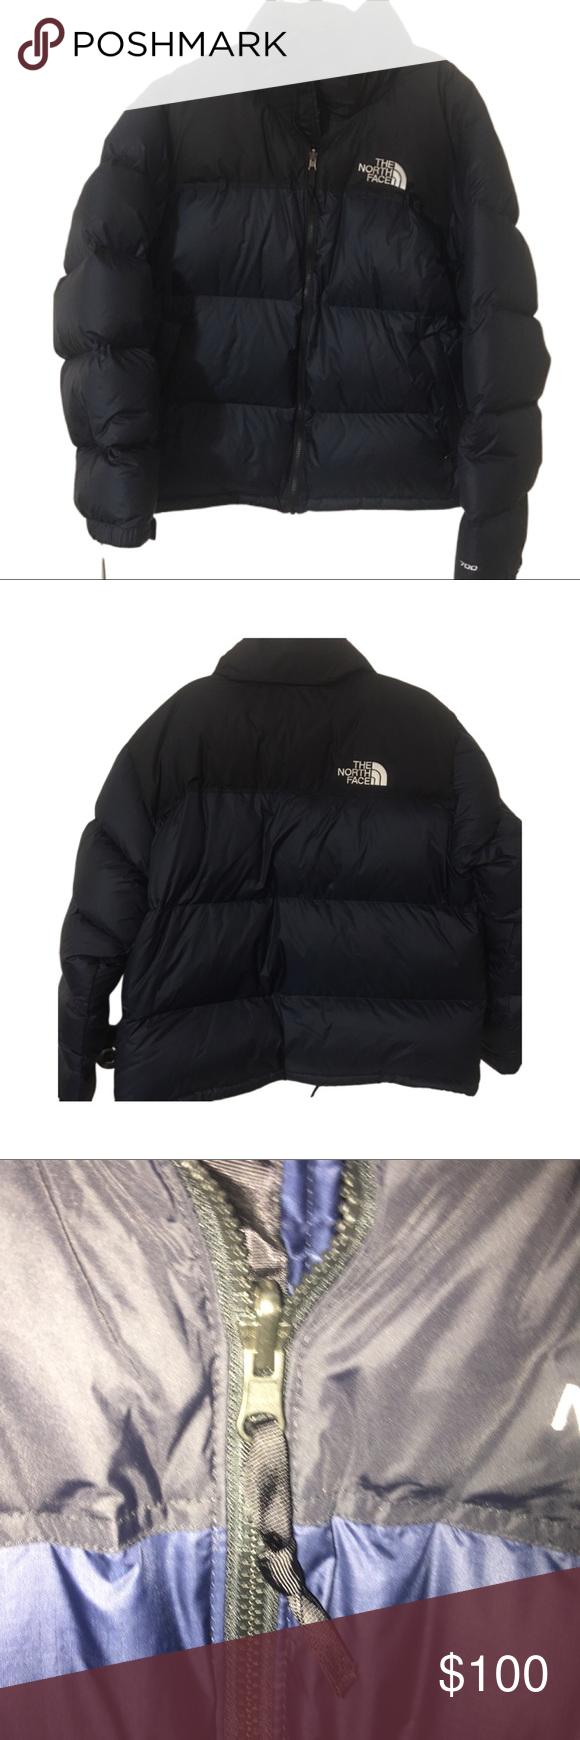 North Face Men S Puffer Jacket Mens Puffer Jacket North Face Mens North Face Jacket [ 1740 x 580 Pixel ]